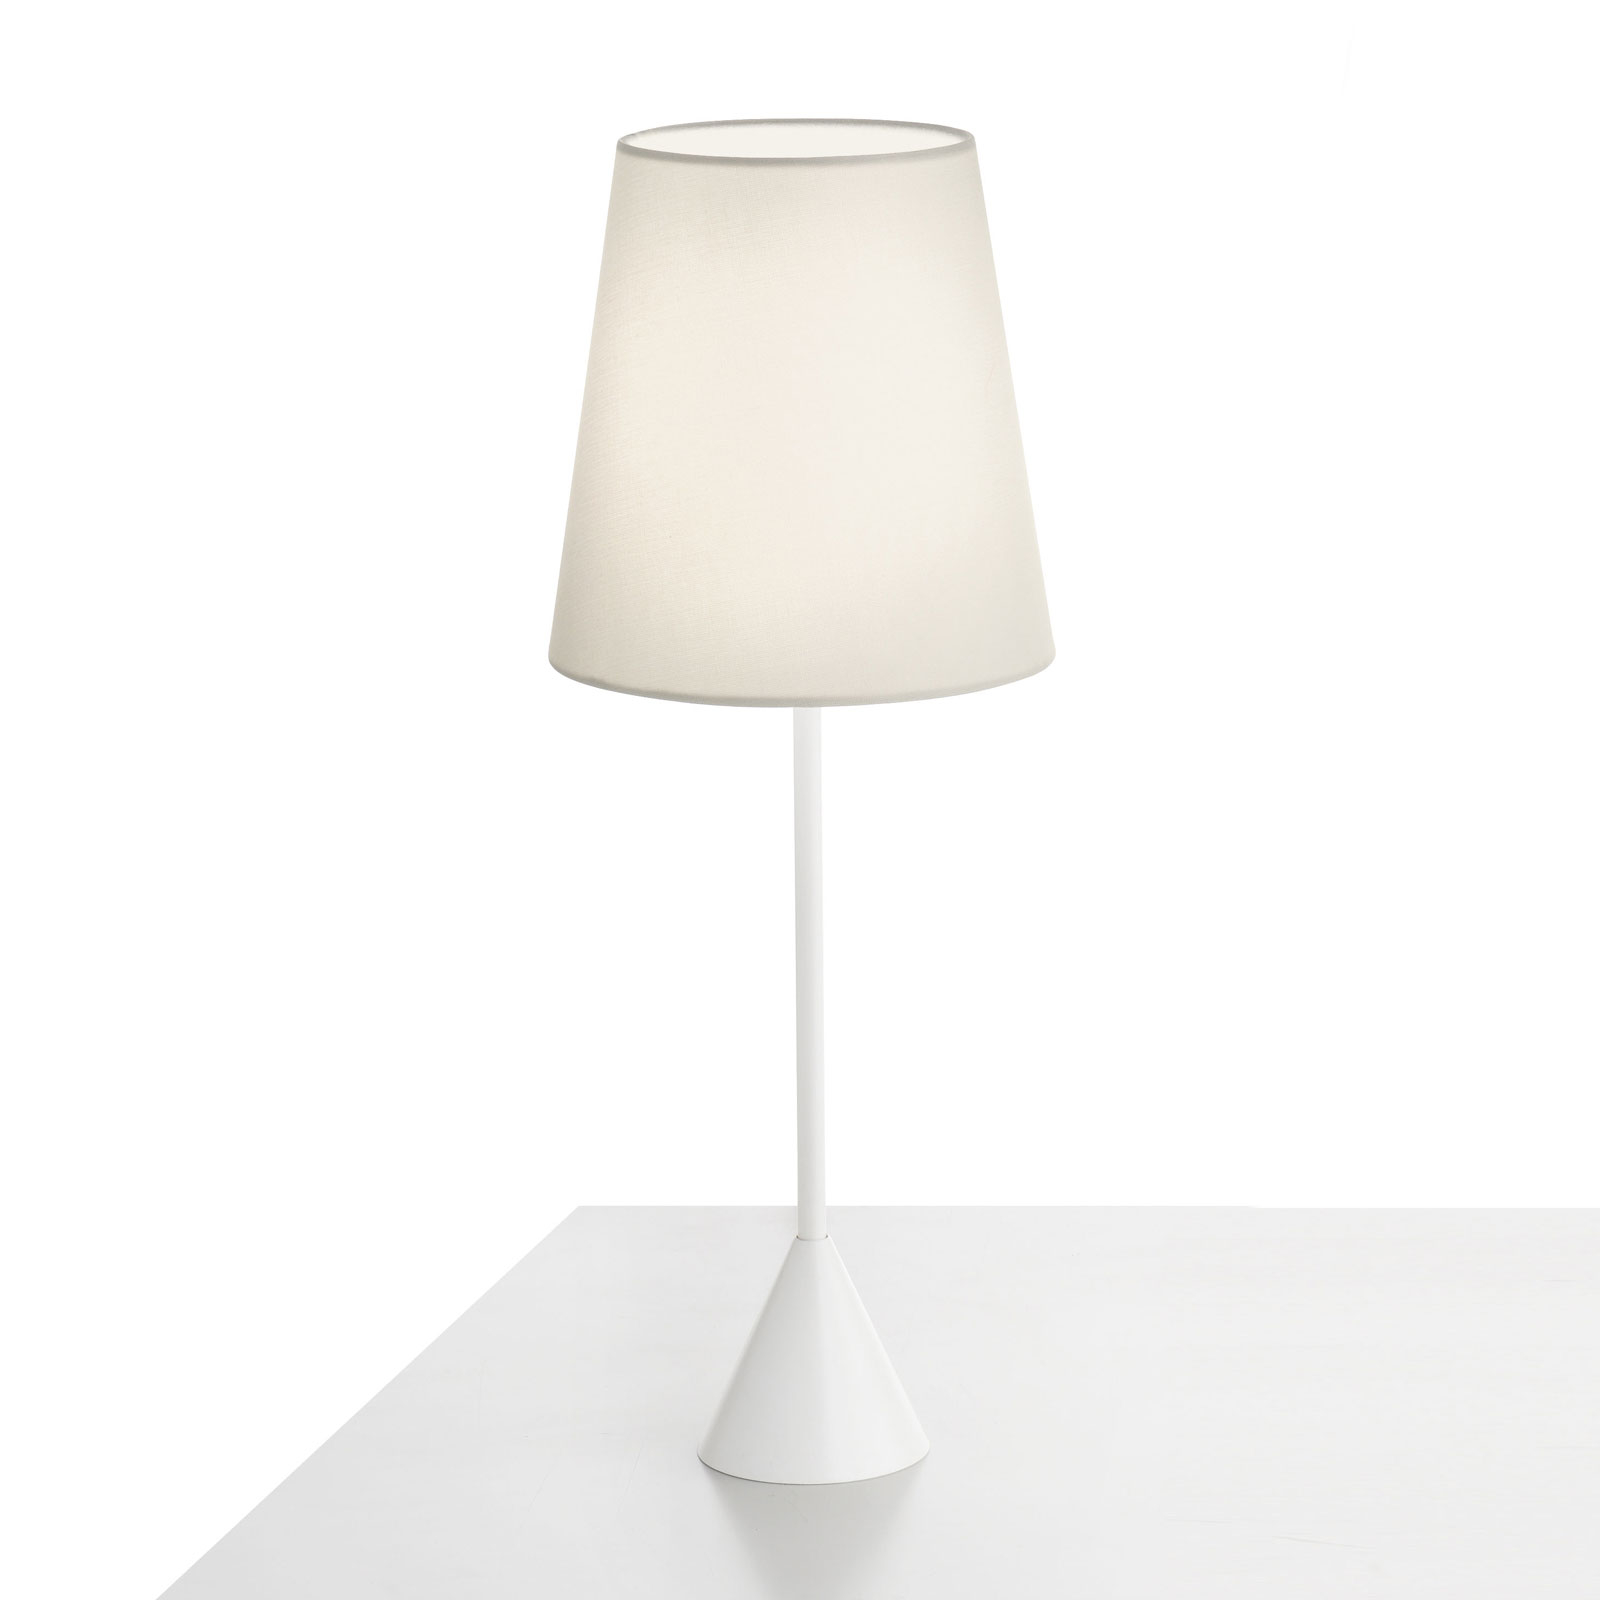 Modo Luce Lucilla tafellamp Ø 17cm wit/ivoor